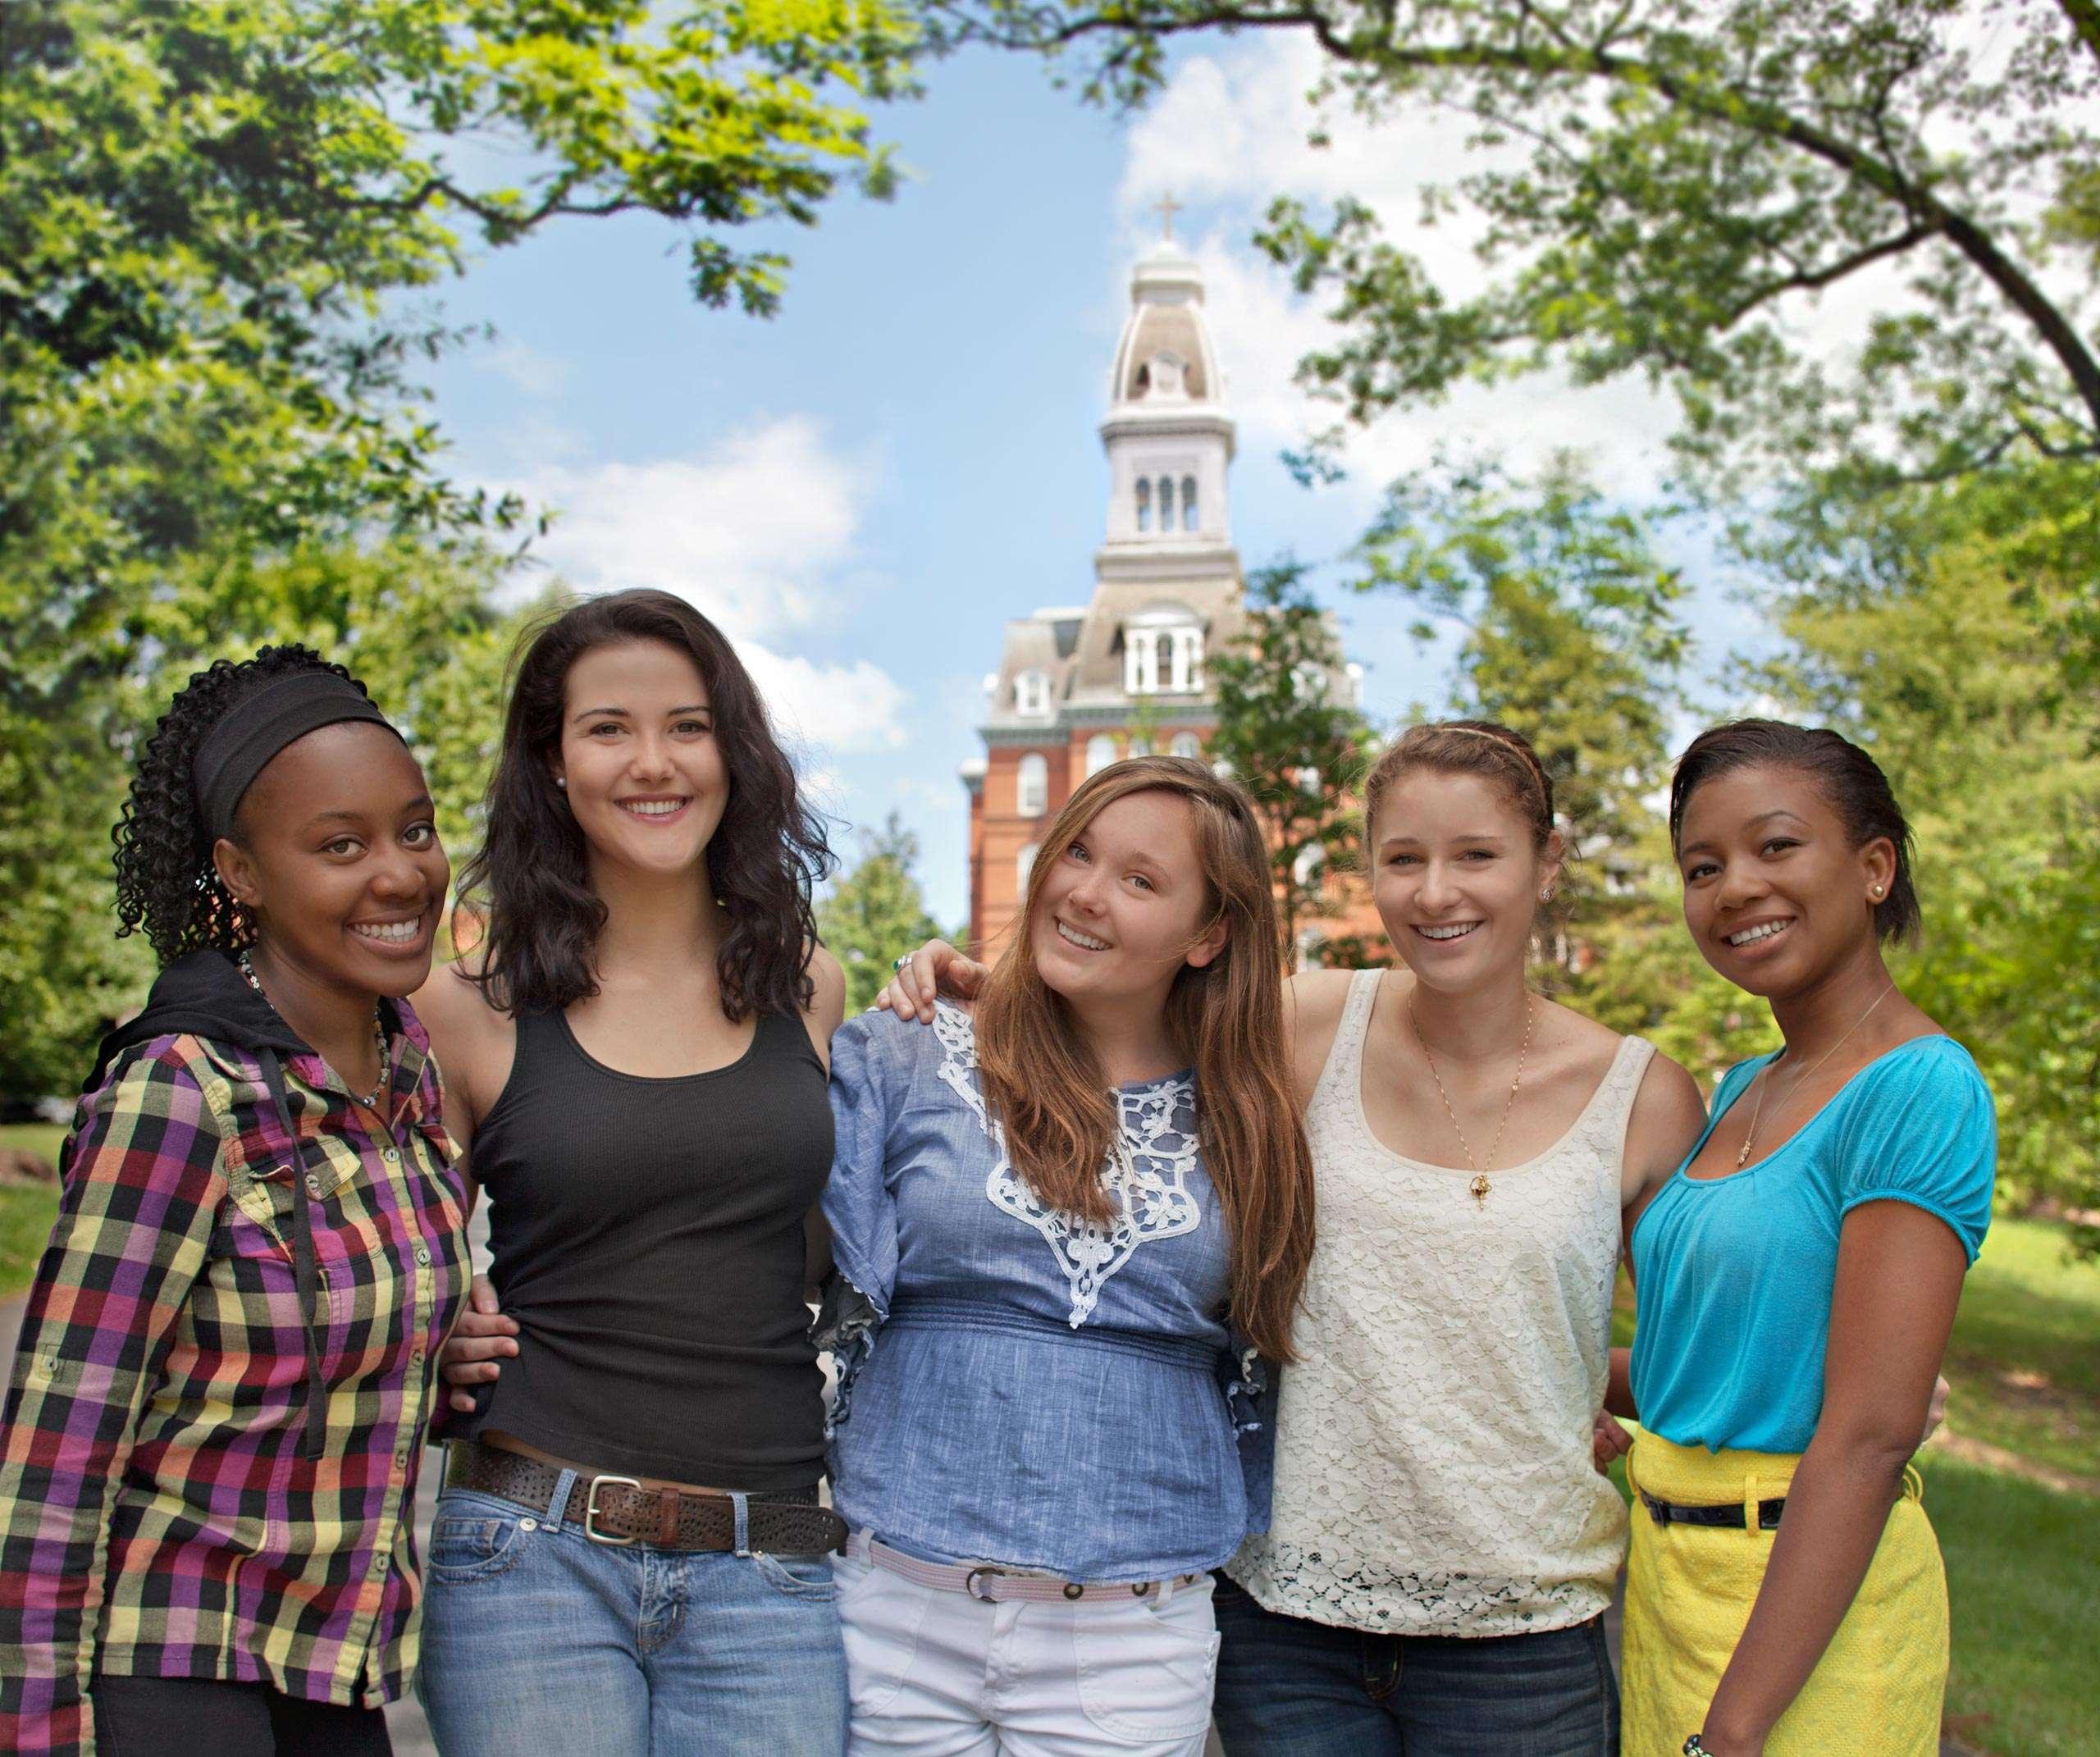 PORTFOLIO - People  #5 Students at Notre Dame of Maryland University